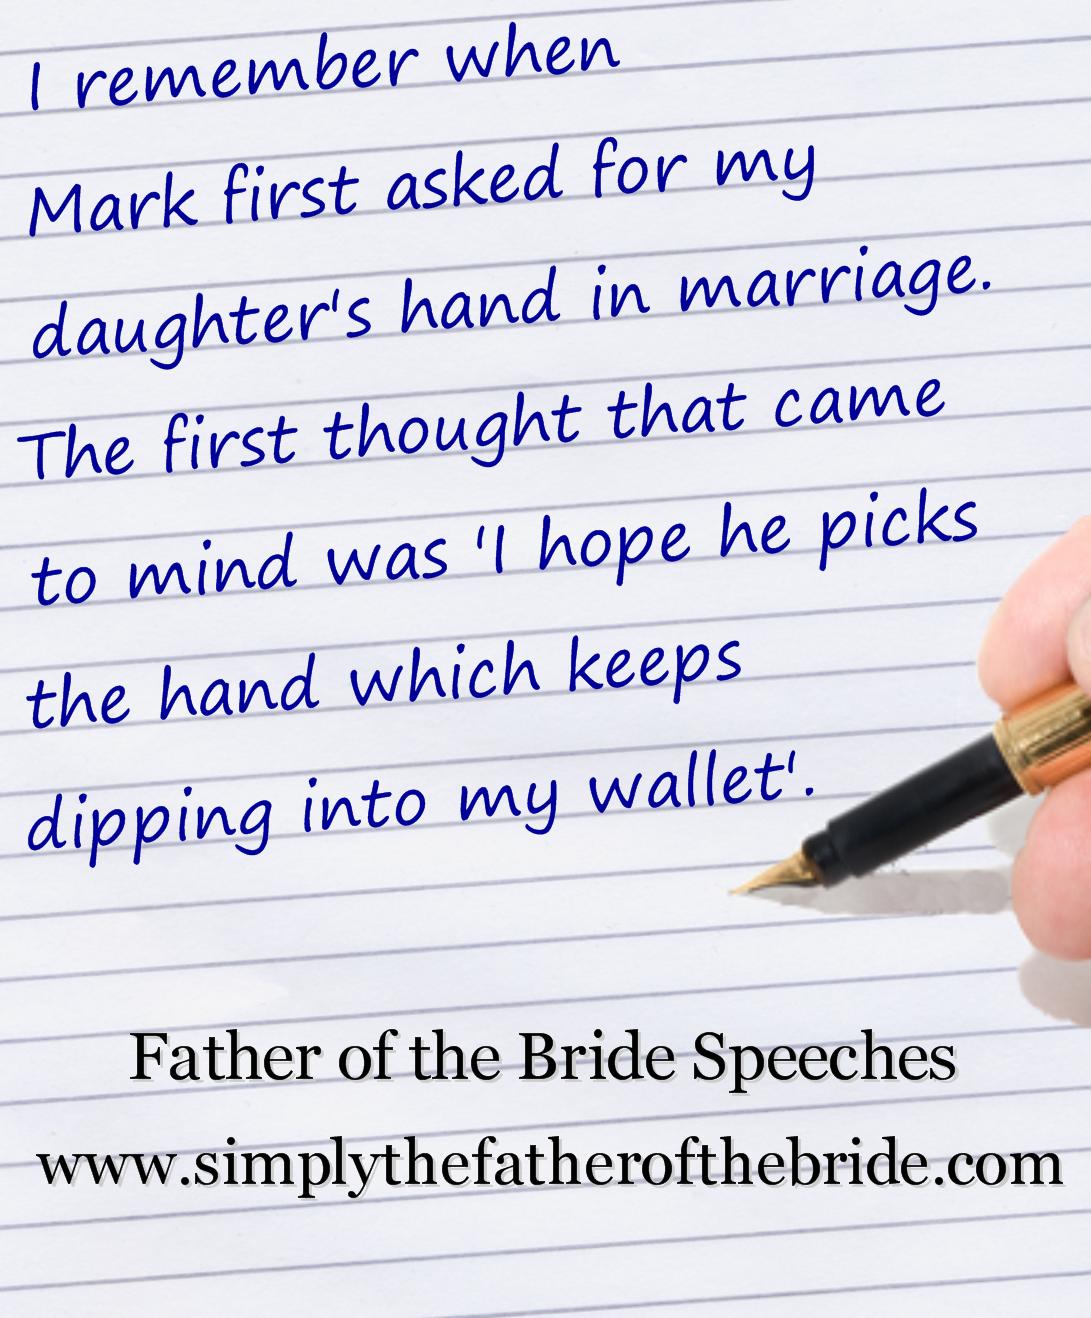 Giving The Bride Away Wedding Speech Father Of The Bride Bride Speech Examples